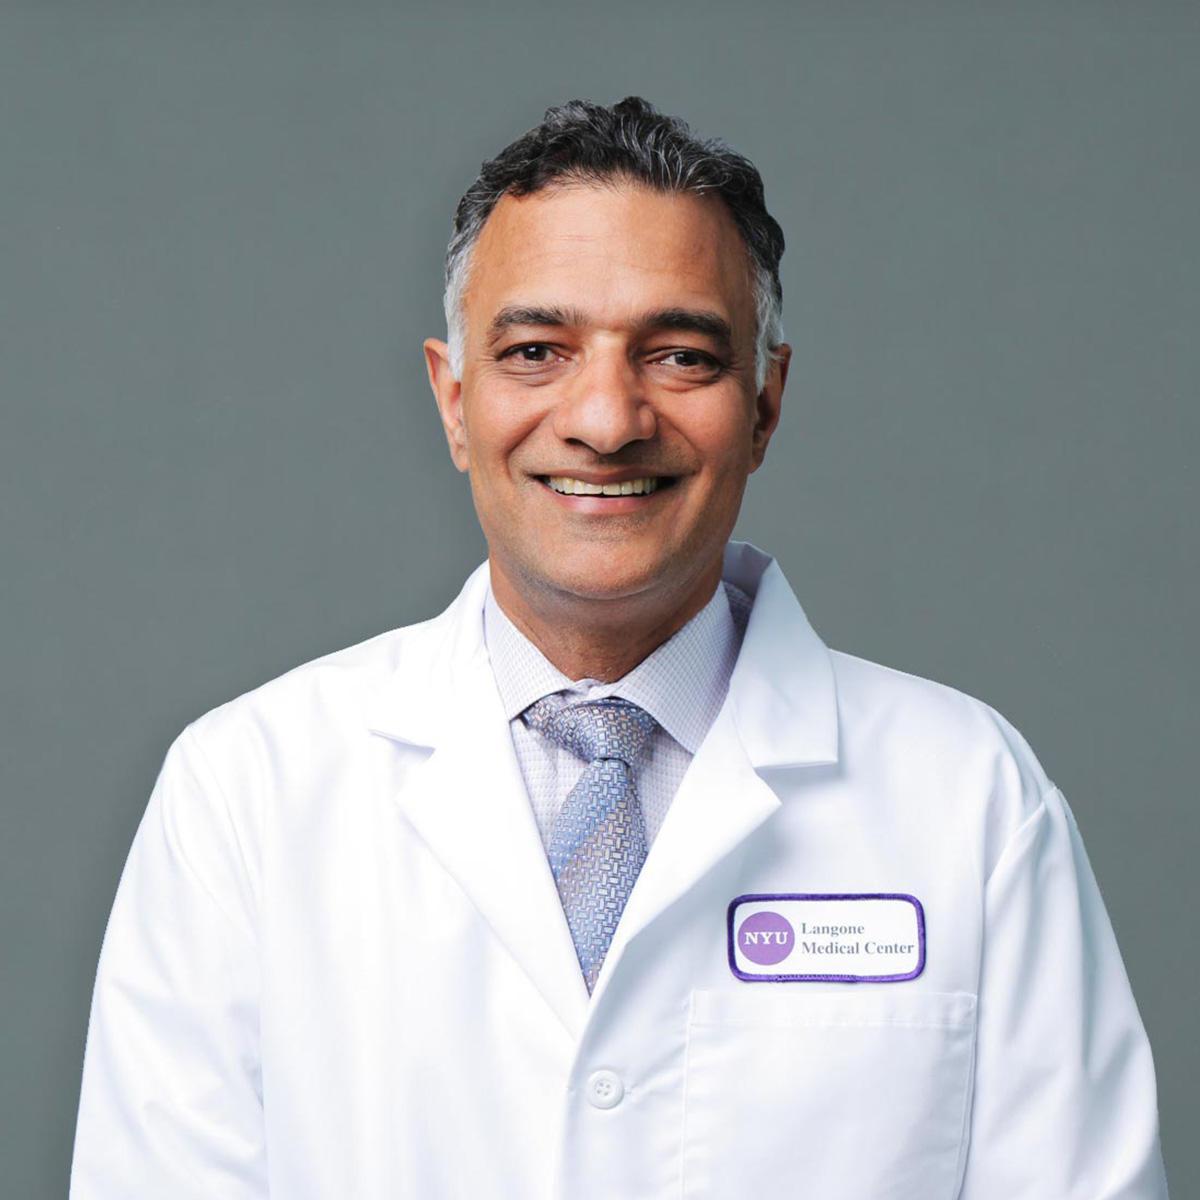 Ramesh H. Gidumal, MD